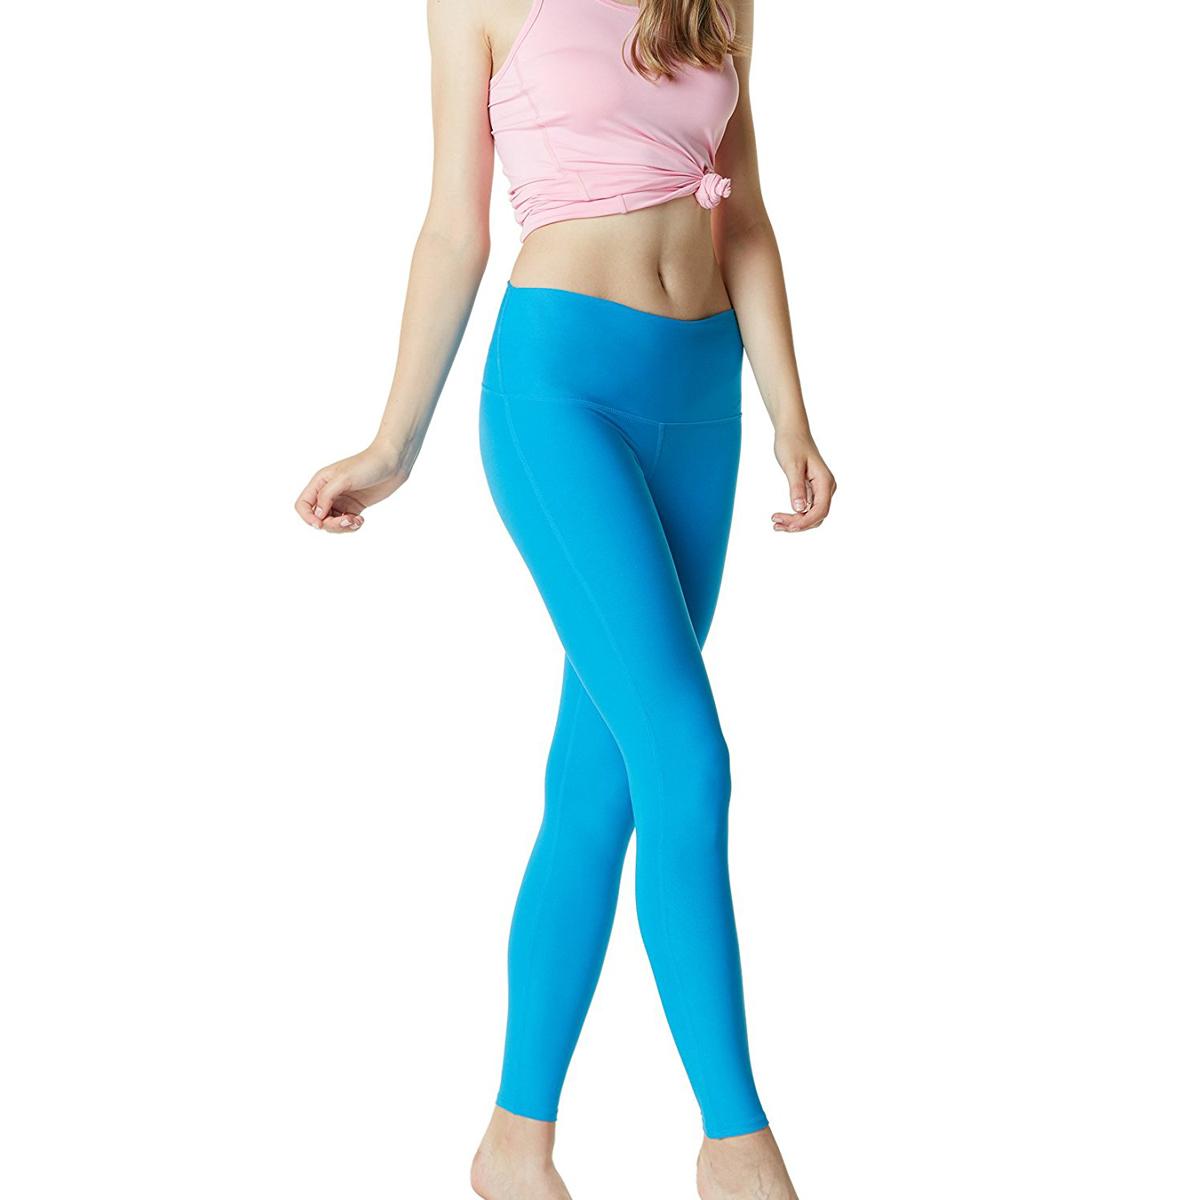 thumbnail 68 - TSLA Tesla FYP42 Women's High-Waisted Ultra-Stretch Tummy Control Yoga Pants